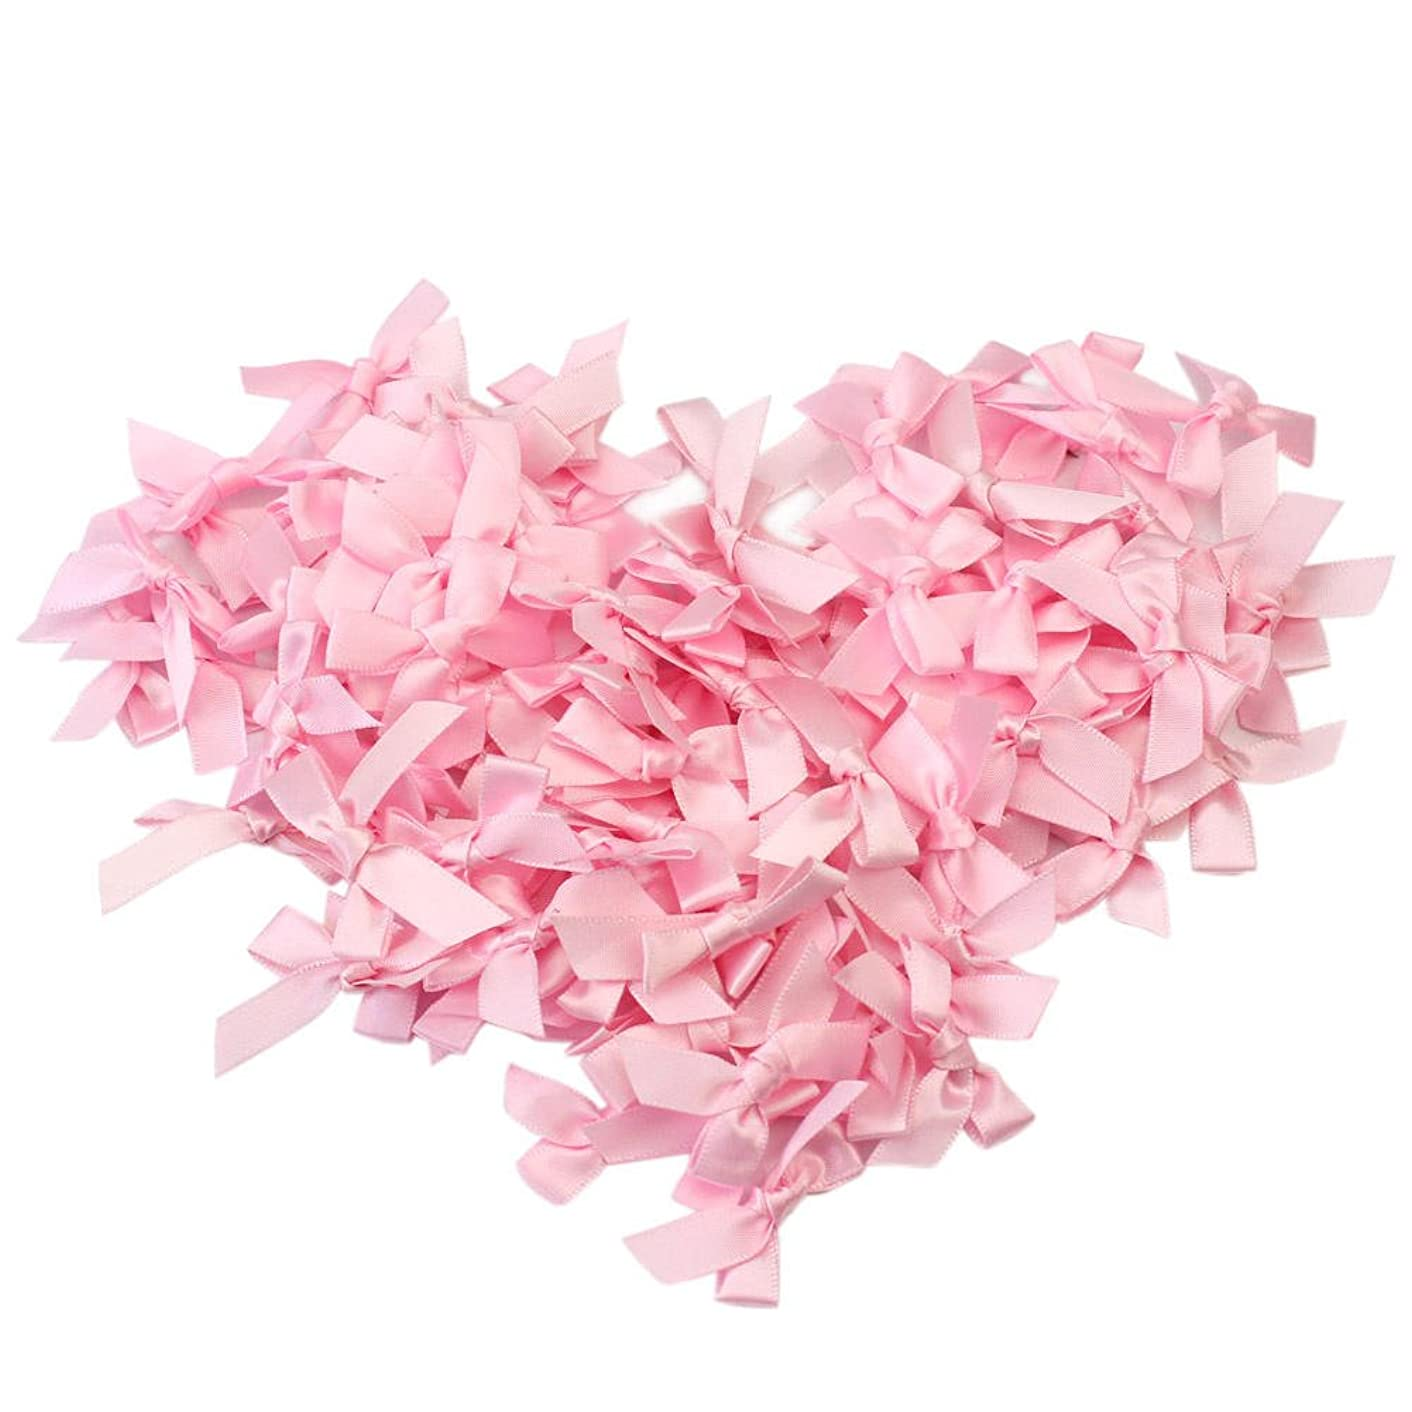 100pcs/Lot Handmade Small Polyester Satin Ribbon Bow Appliques Sewing Craft DIY Kids Girls Headwear Hair Accessories (Pink)